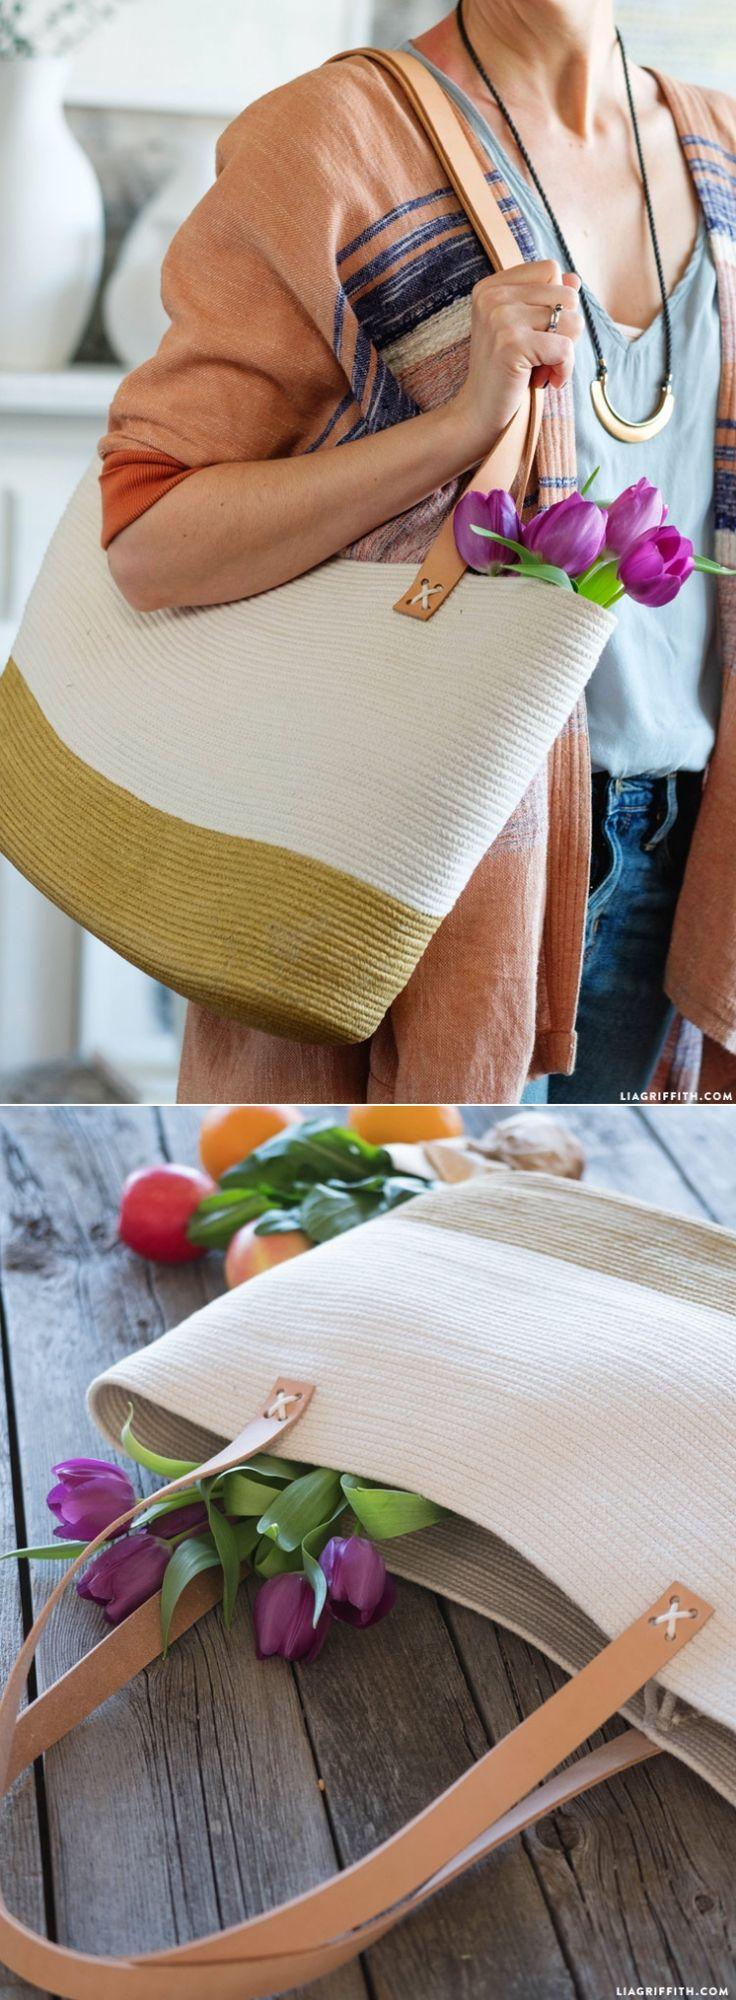 #DIY Rope Bag at www.LiaGriffith.com: